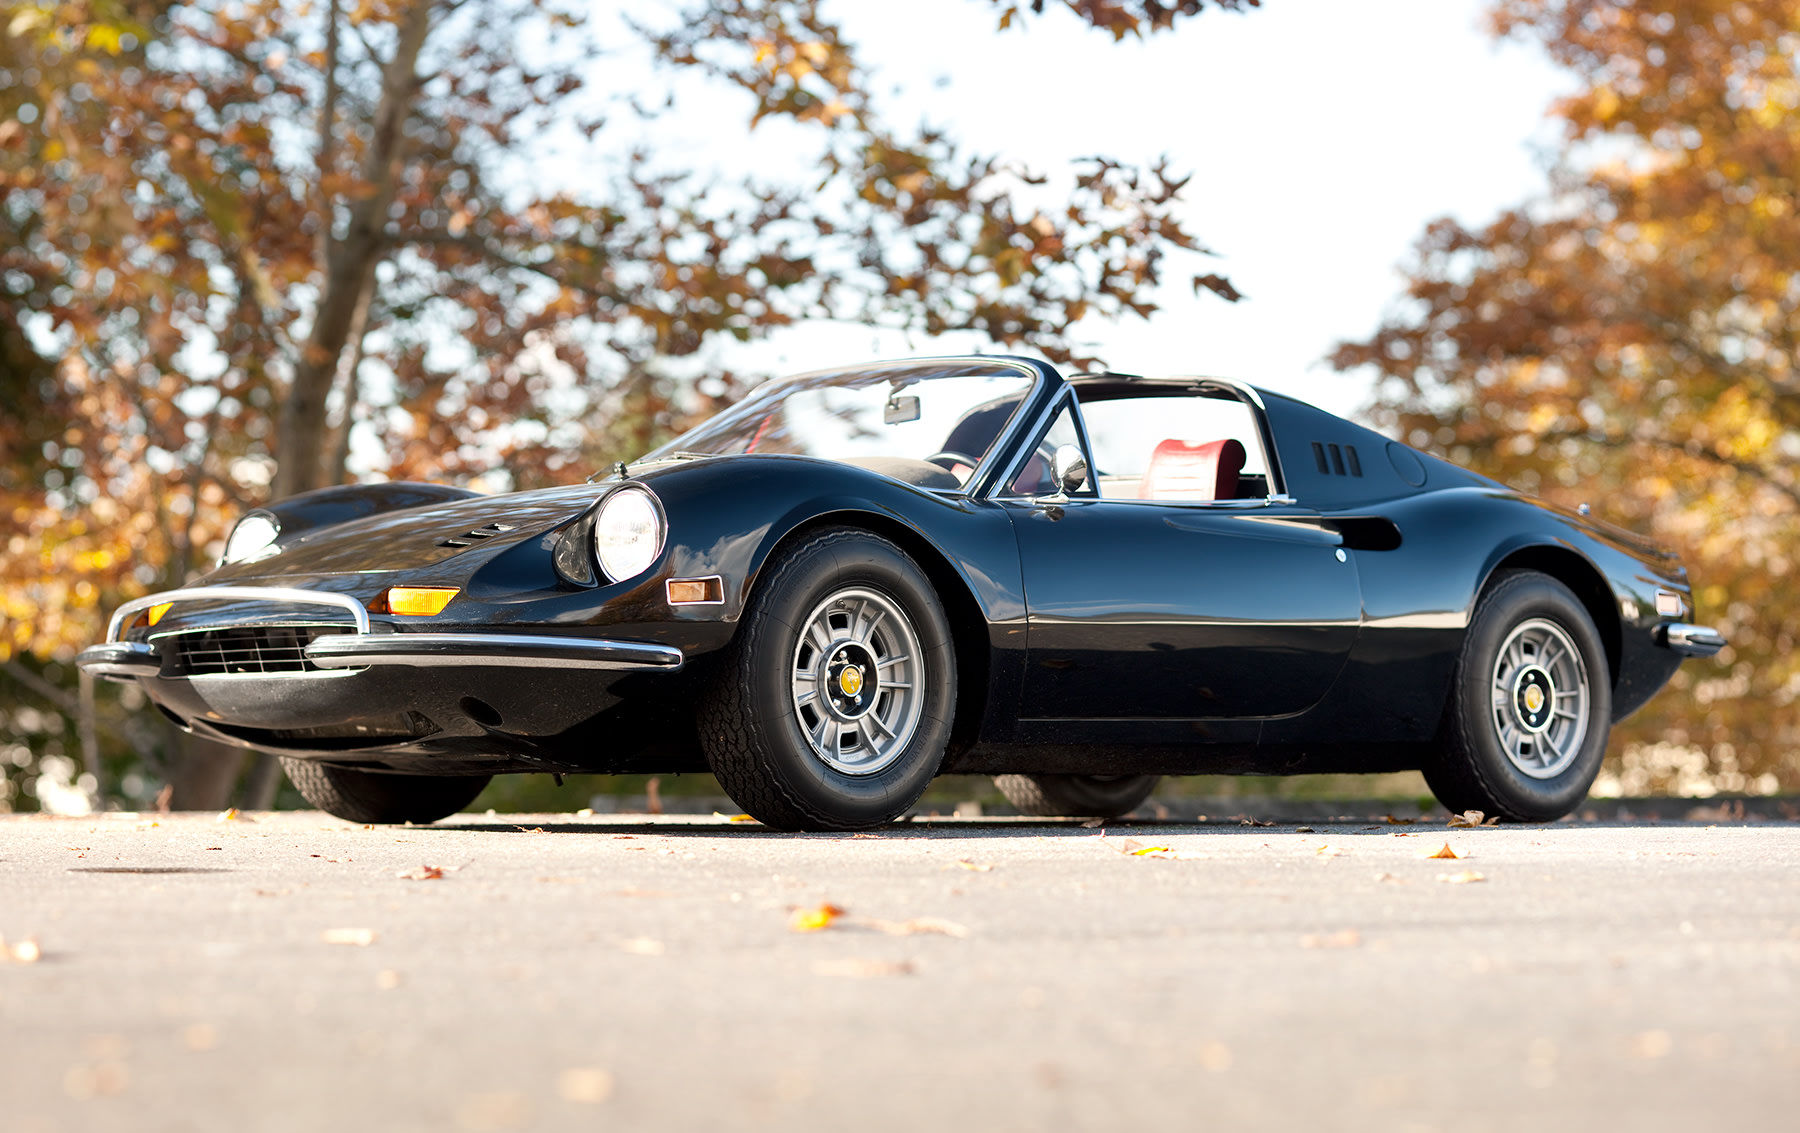 1974 Ferrari Dino 246 GTS (1)